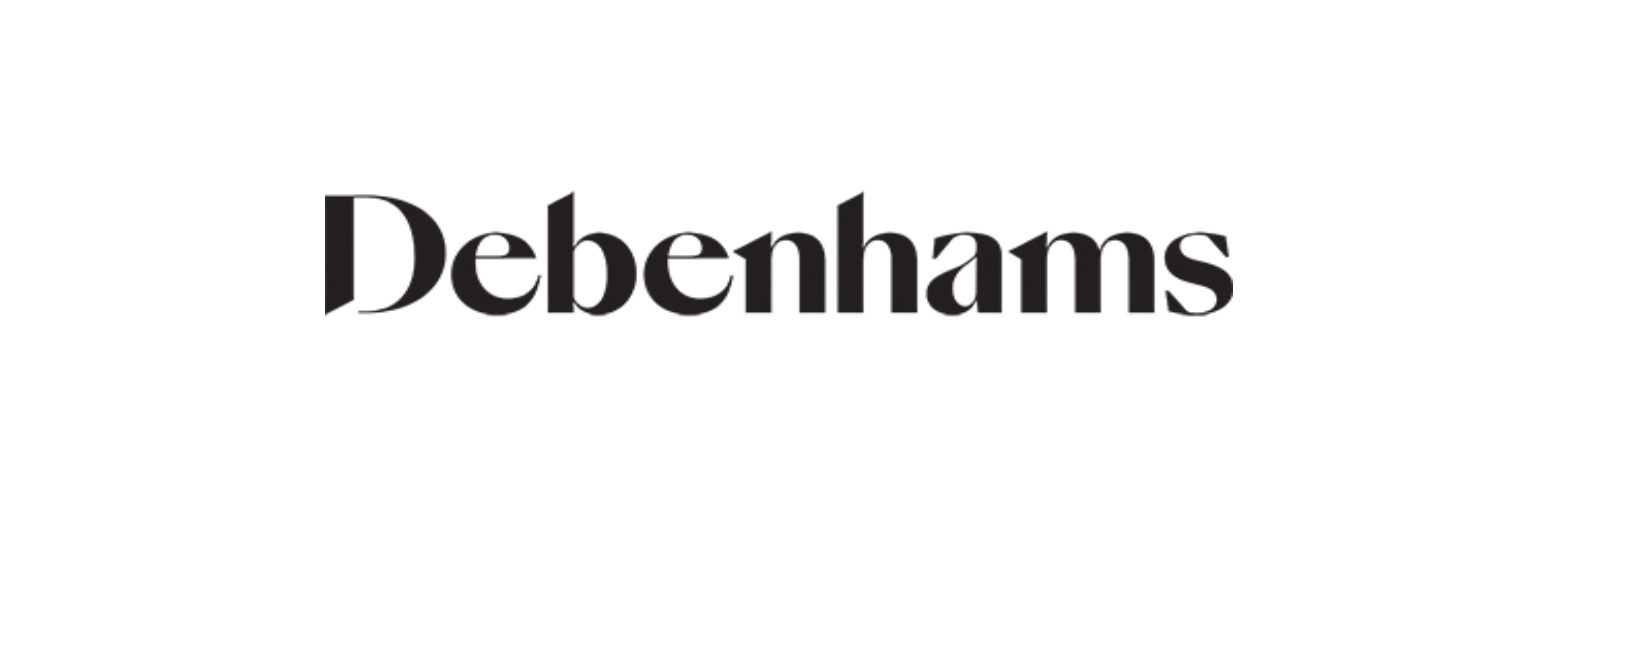 Debenhams Review – Is it legit?